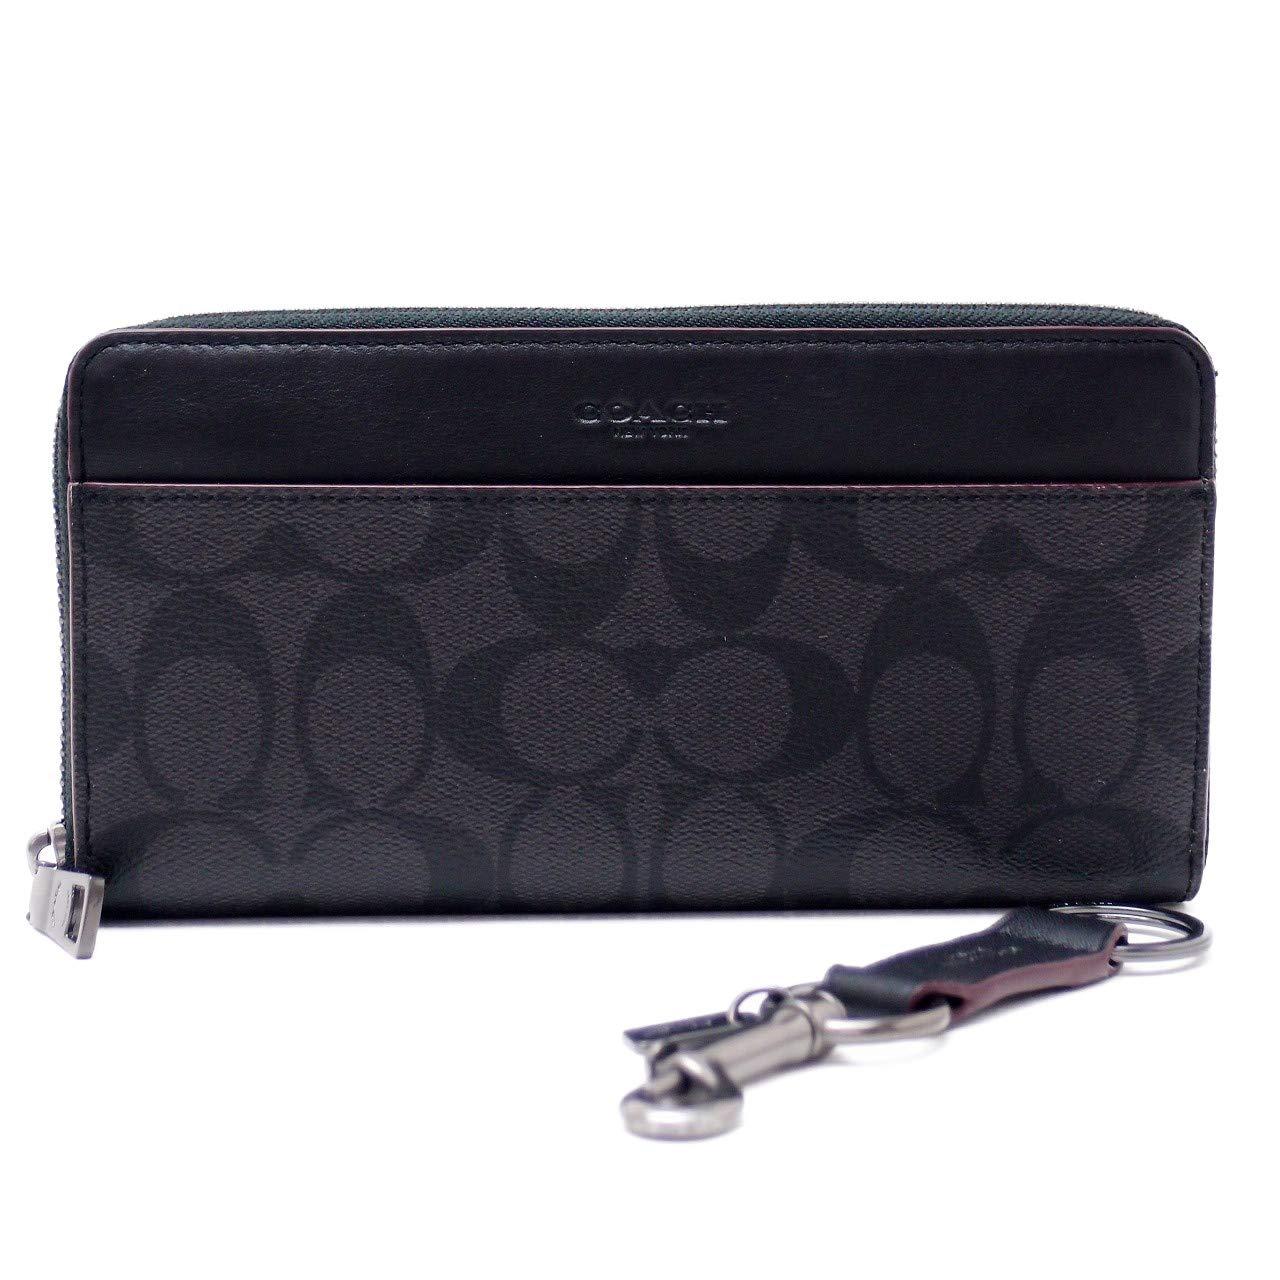 25ddd3f976ec Amazon | [コーチ] COACH 財布 メンズ 長財布 キーリング キーホルダー 2点セット ギフトセット 41345N3A  [アウトレット品] [並行輸入品] | COACH(コーチ) | 財布